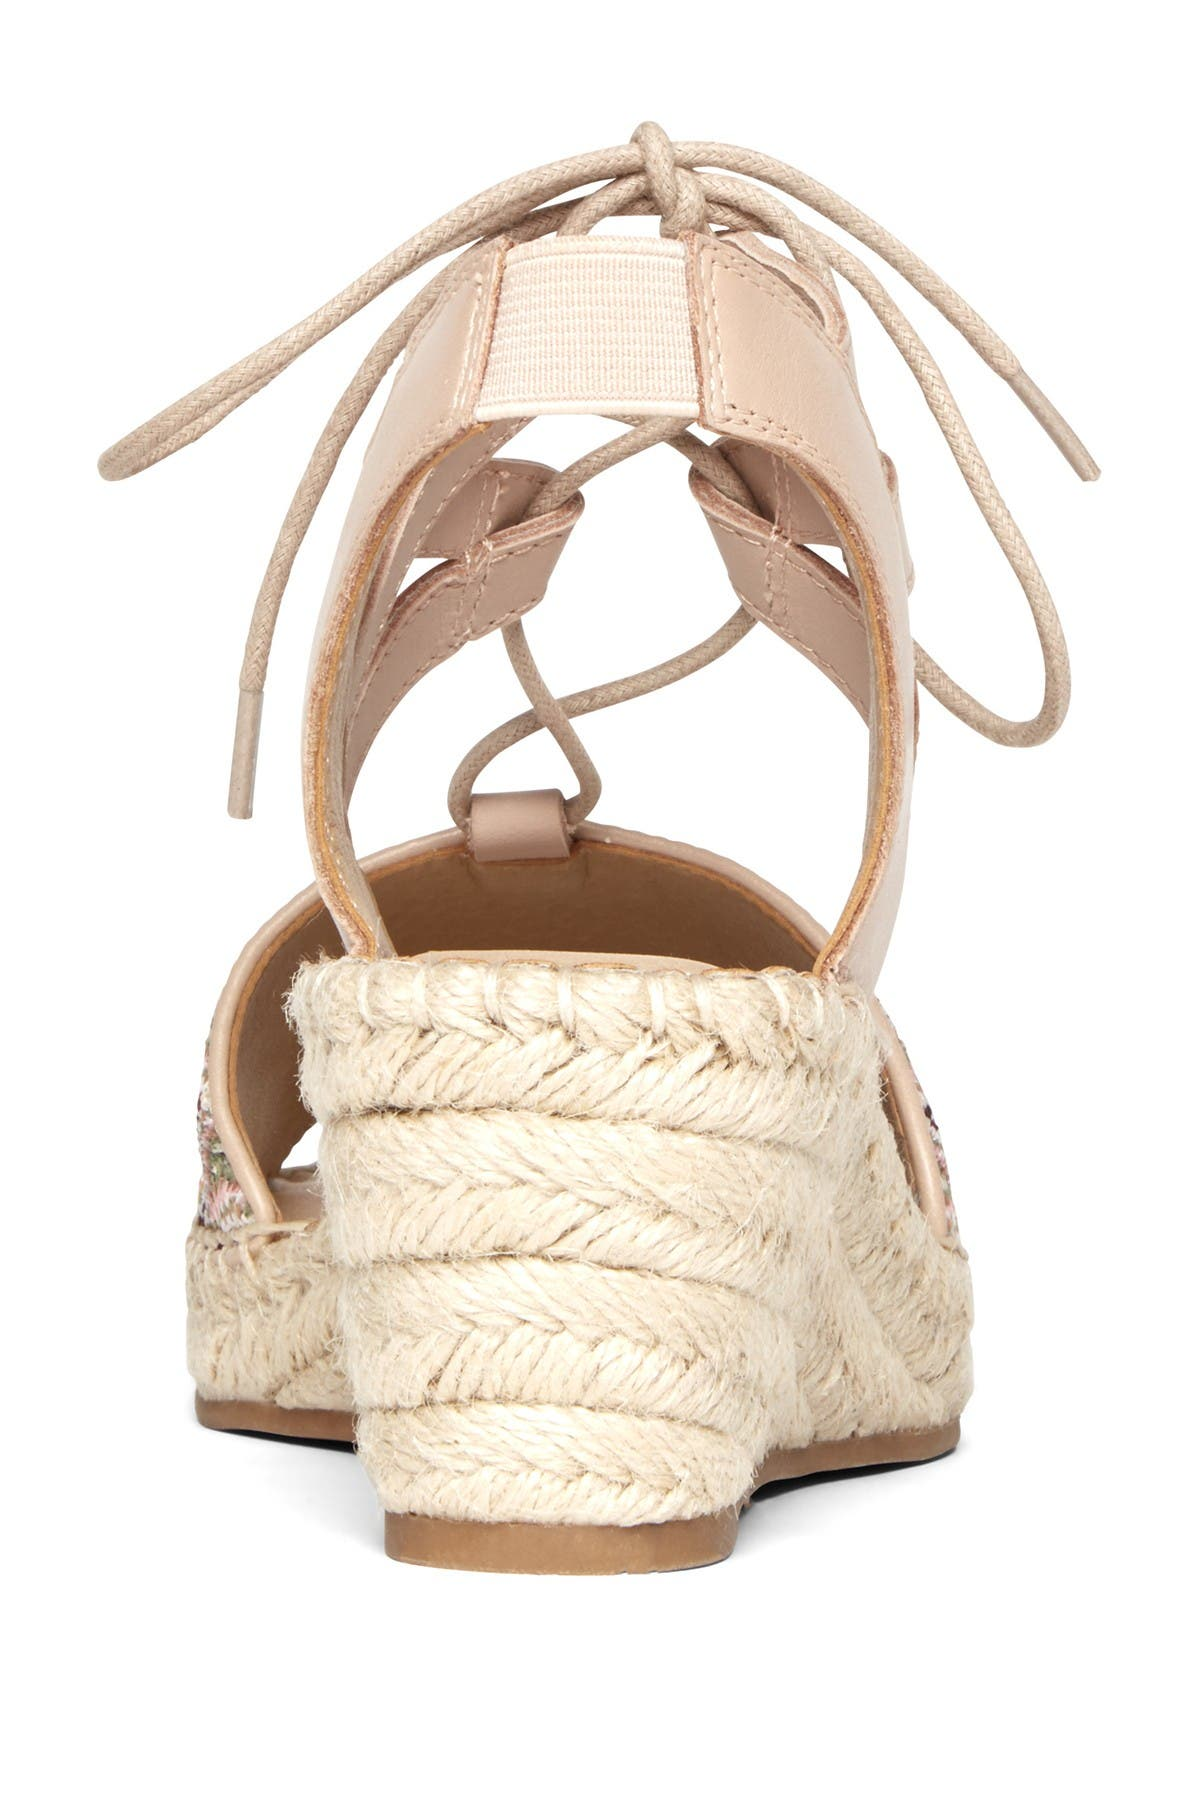 Image of Rockport Marah Lace Espadrille Sandal